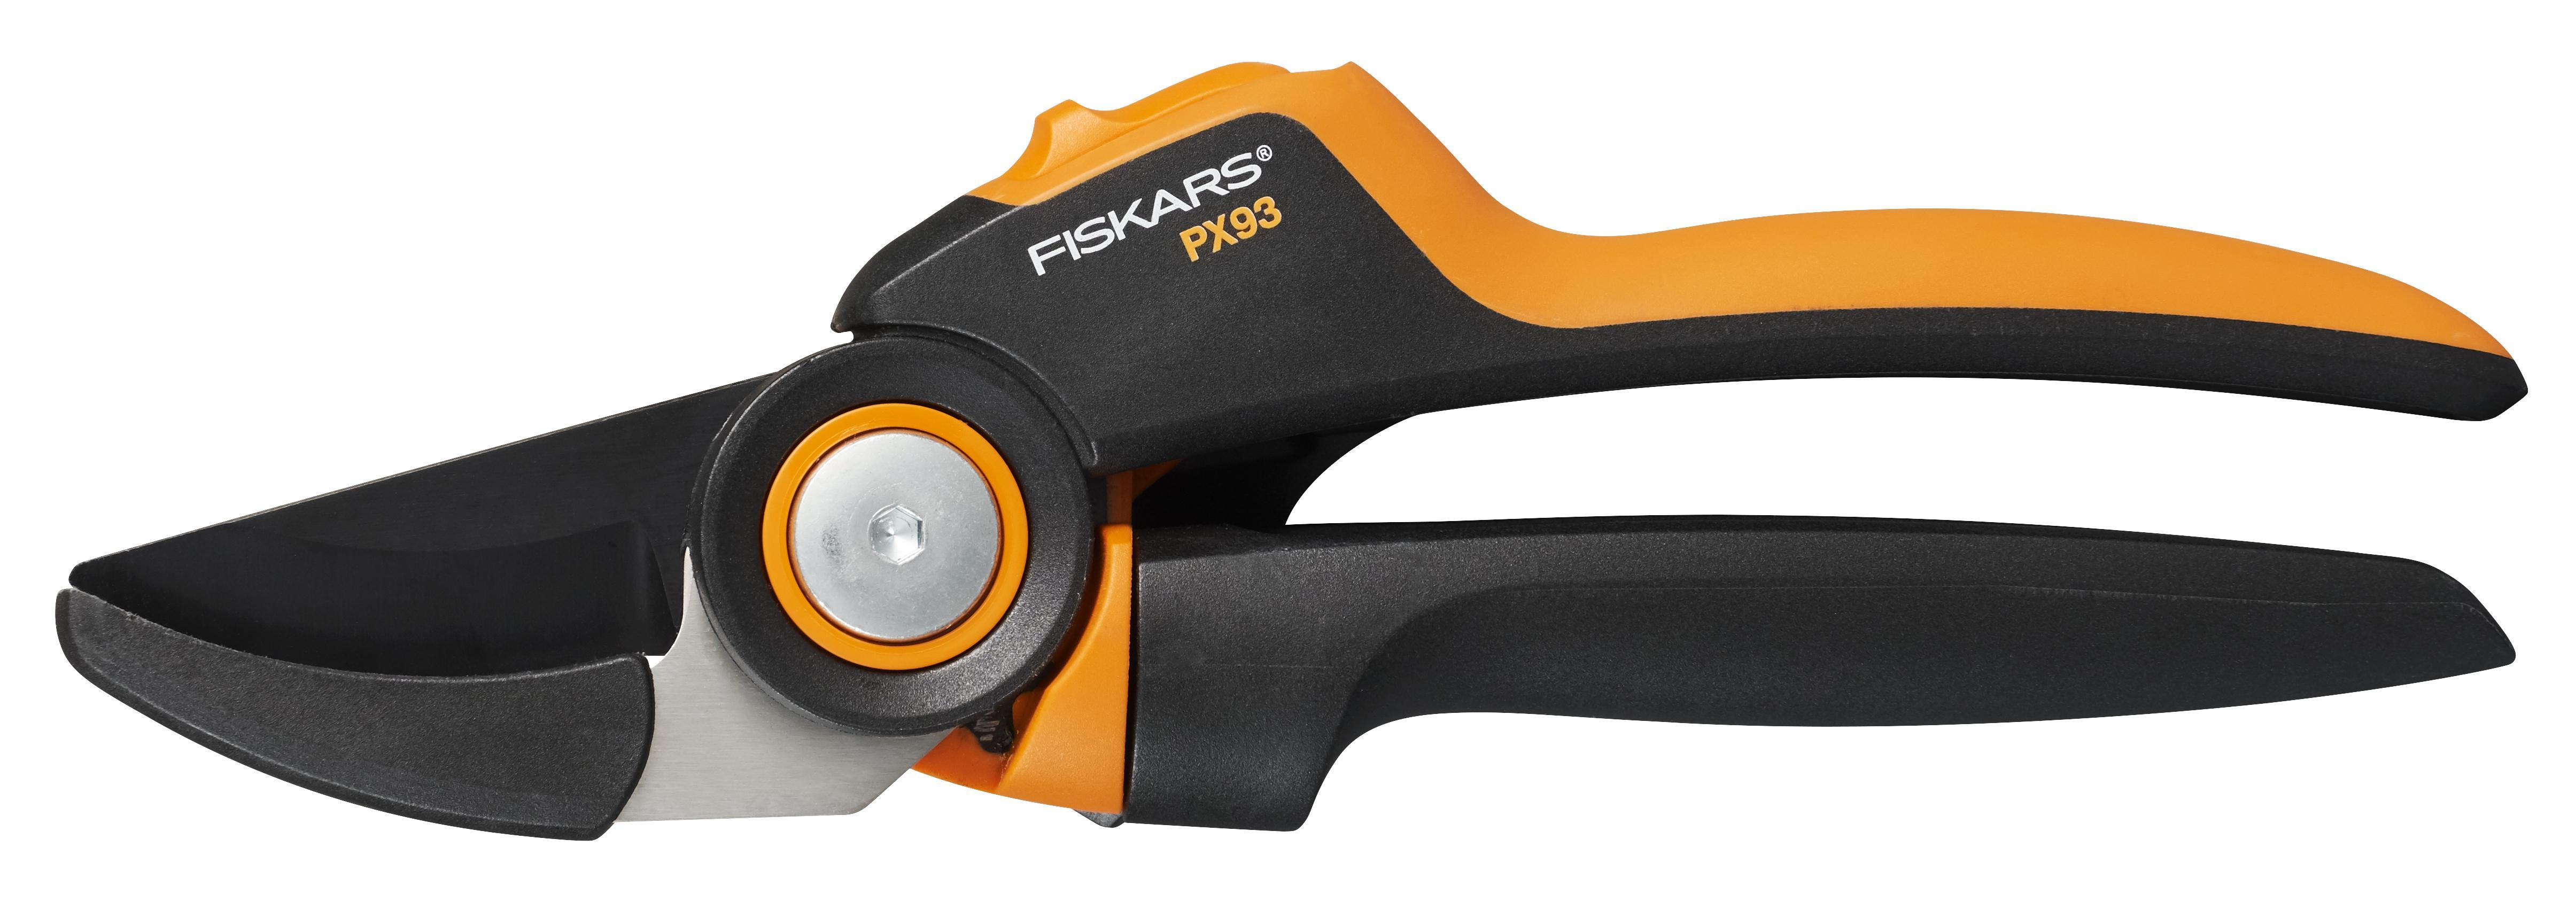 Секатор Fiskars Power gear l px93 сучкорез fiskars большой контактный l l 77 112580